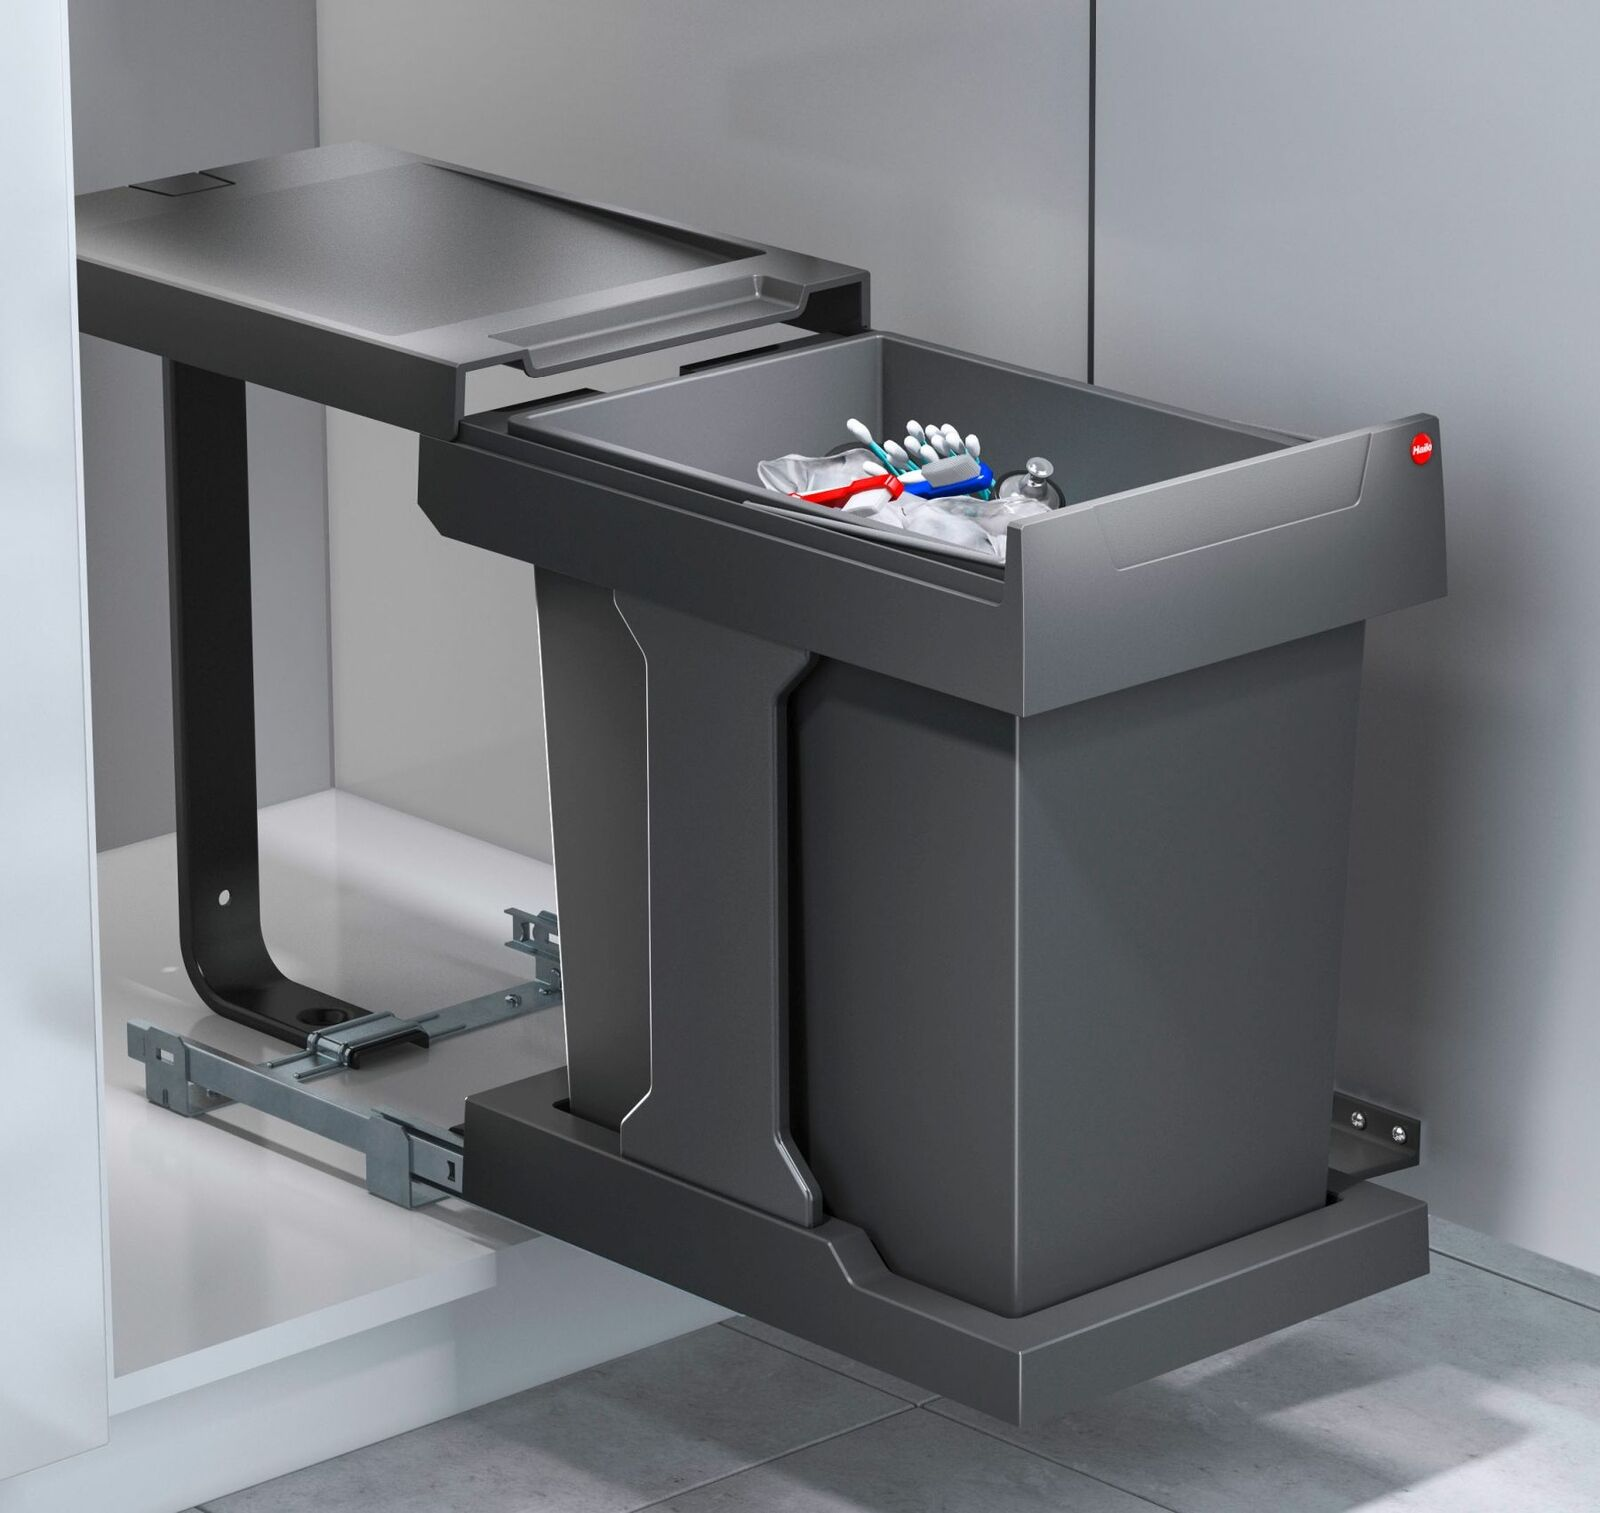 Abfalleimer Küche Ausfahrautomatik Mülleimer Einbau ab 199 cm 19x19 Liter  *5766196